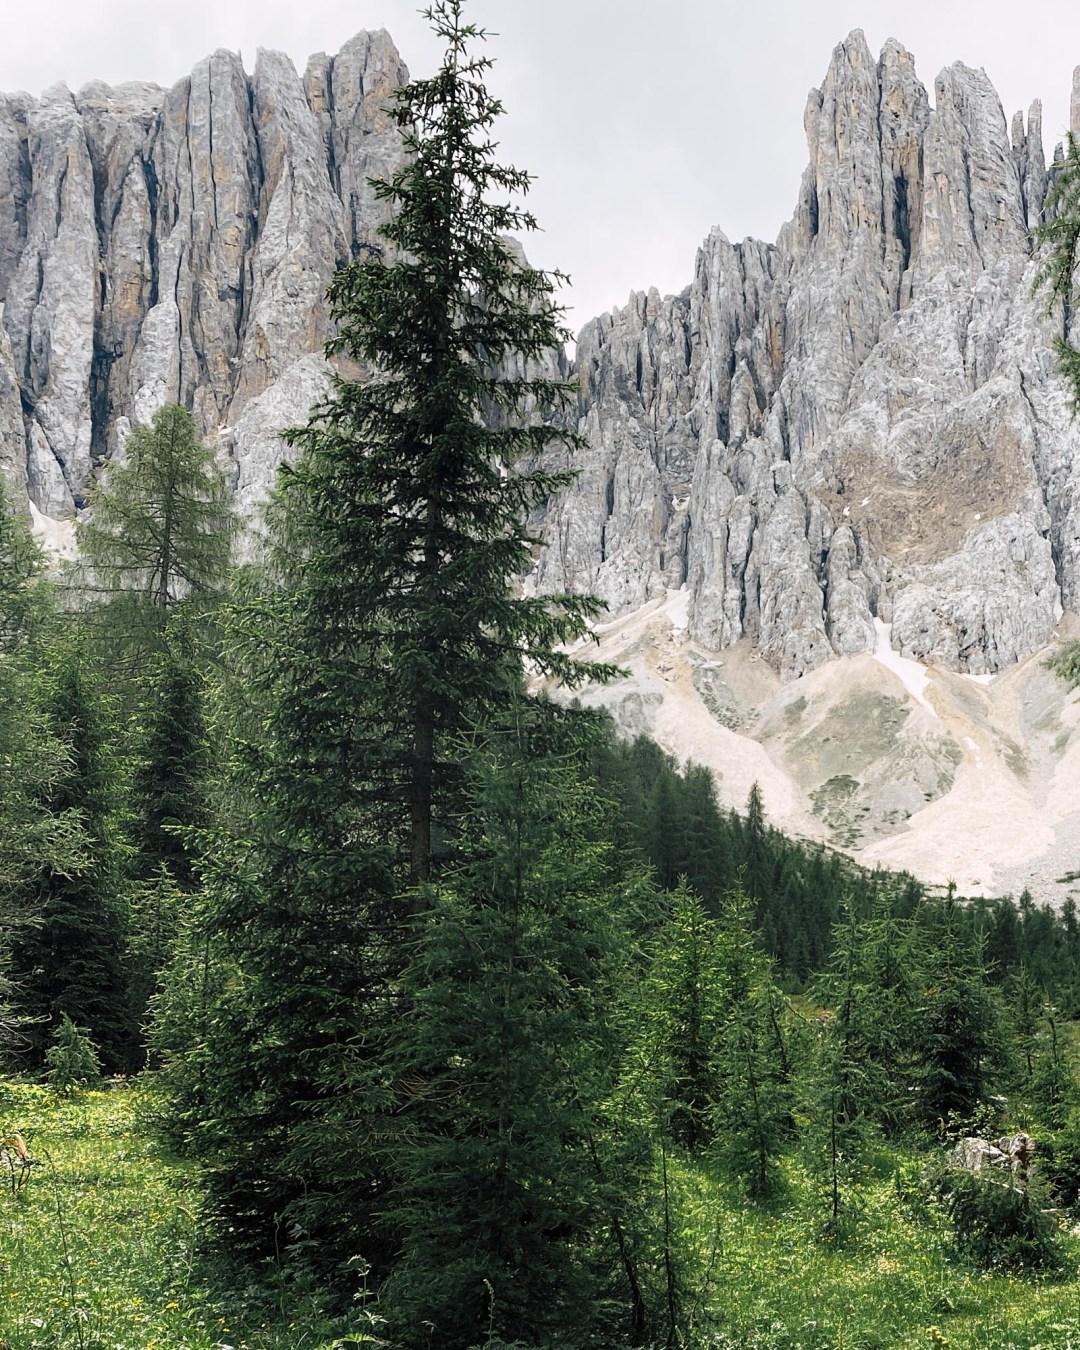 Inastil, Südtirol, Vitalpinahotels, Pflösl, Deutschnofen, Eggental, Latemar, Dolomiten, Travelblogger, Ü50Blogger, Urlaub, Ü50Lifestyle, Reiseblogger, Ü50Reisen-55